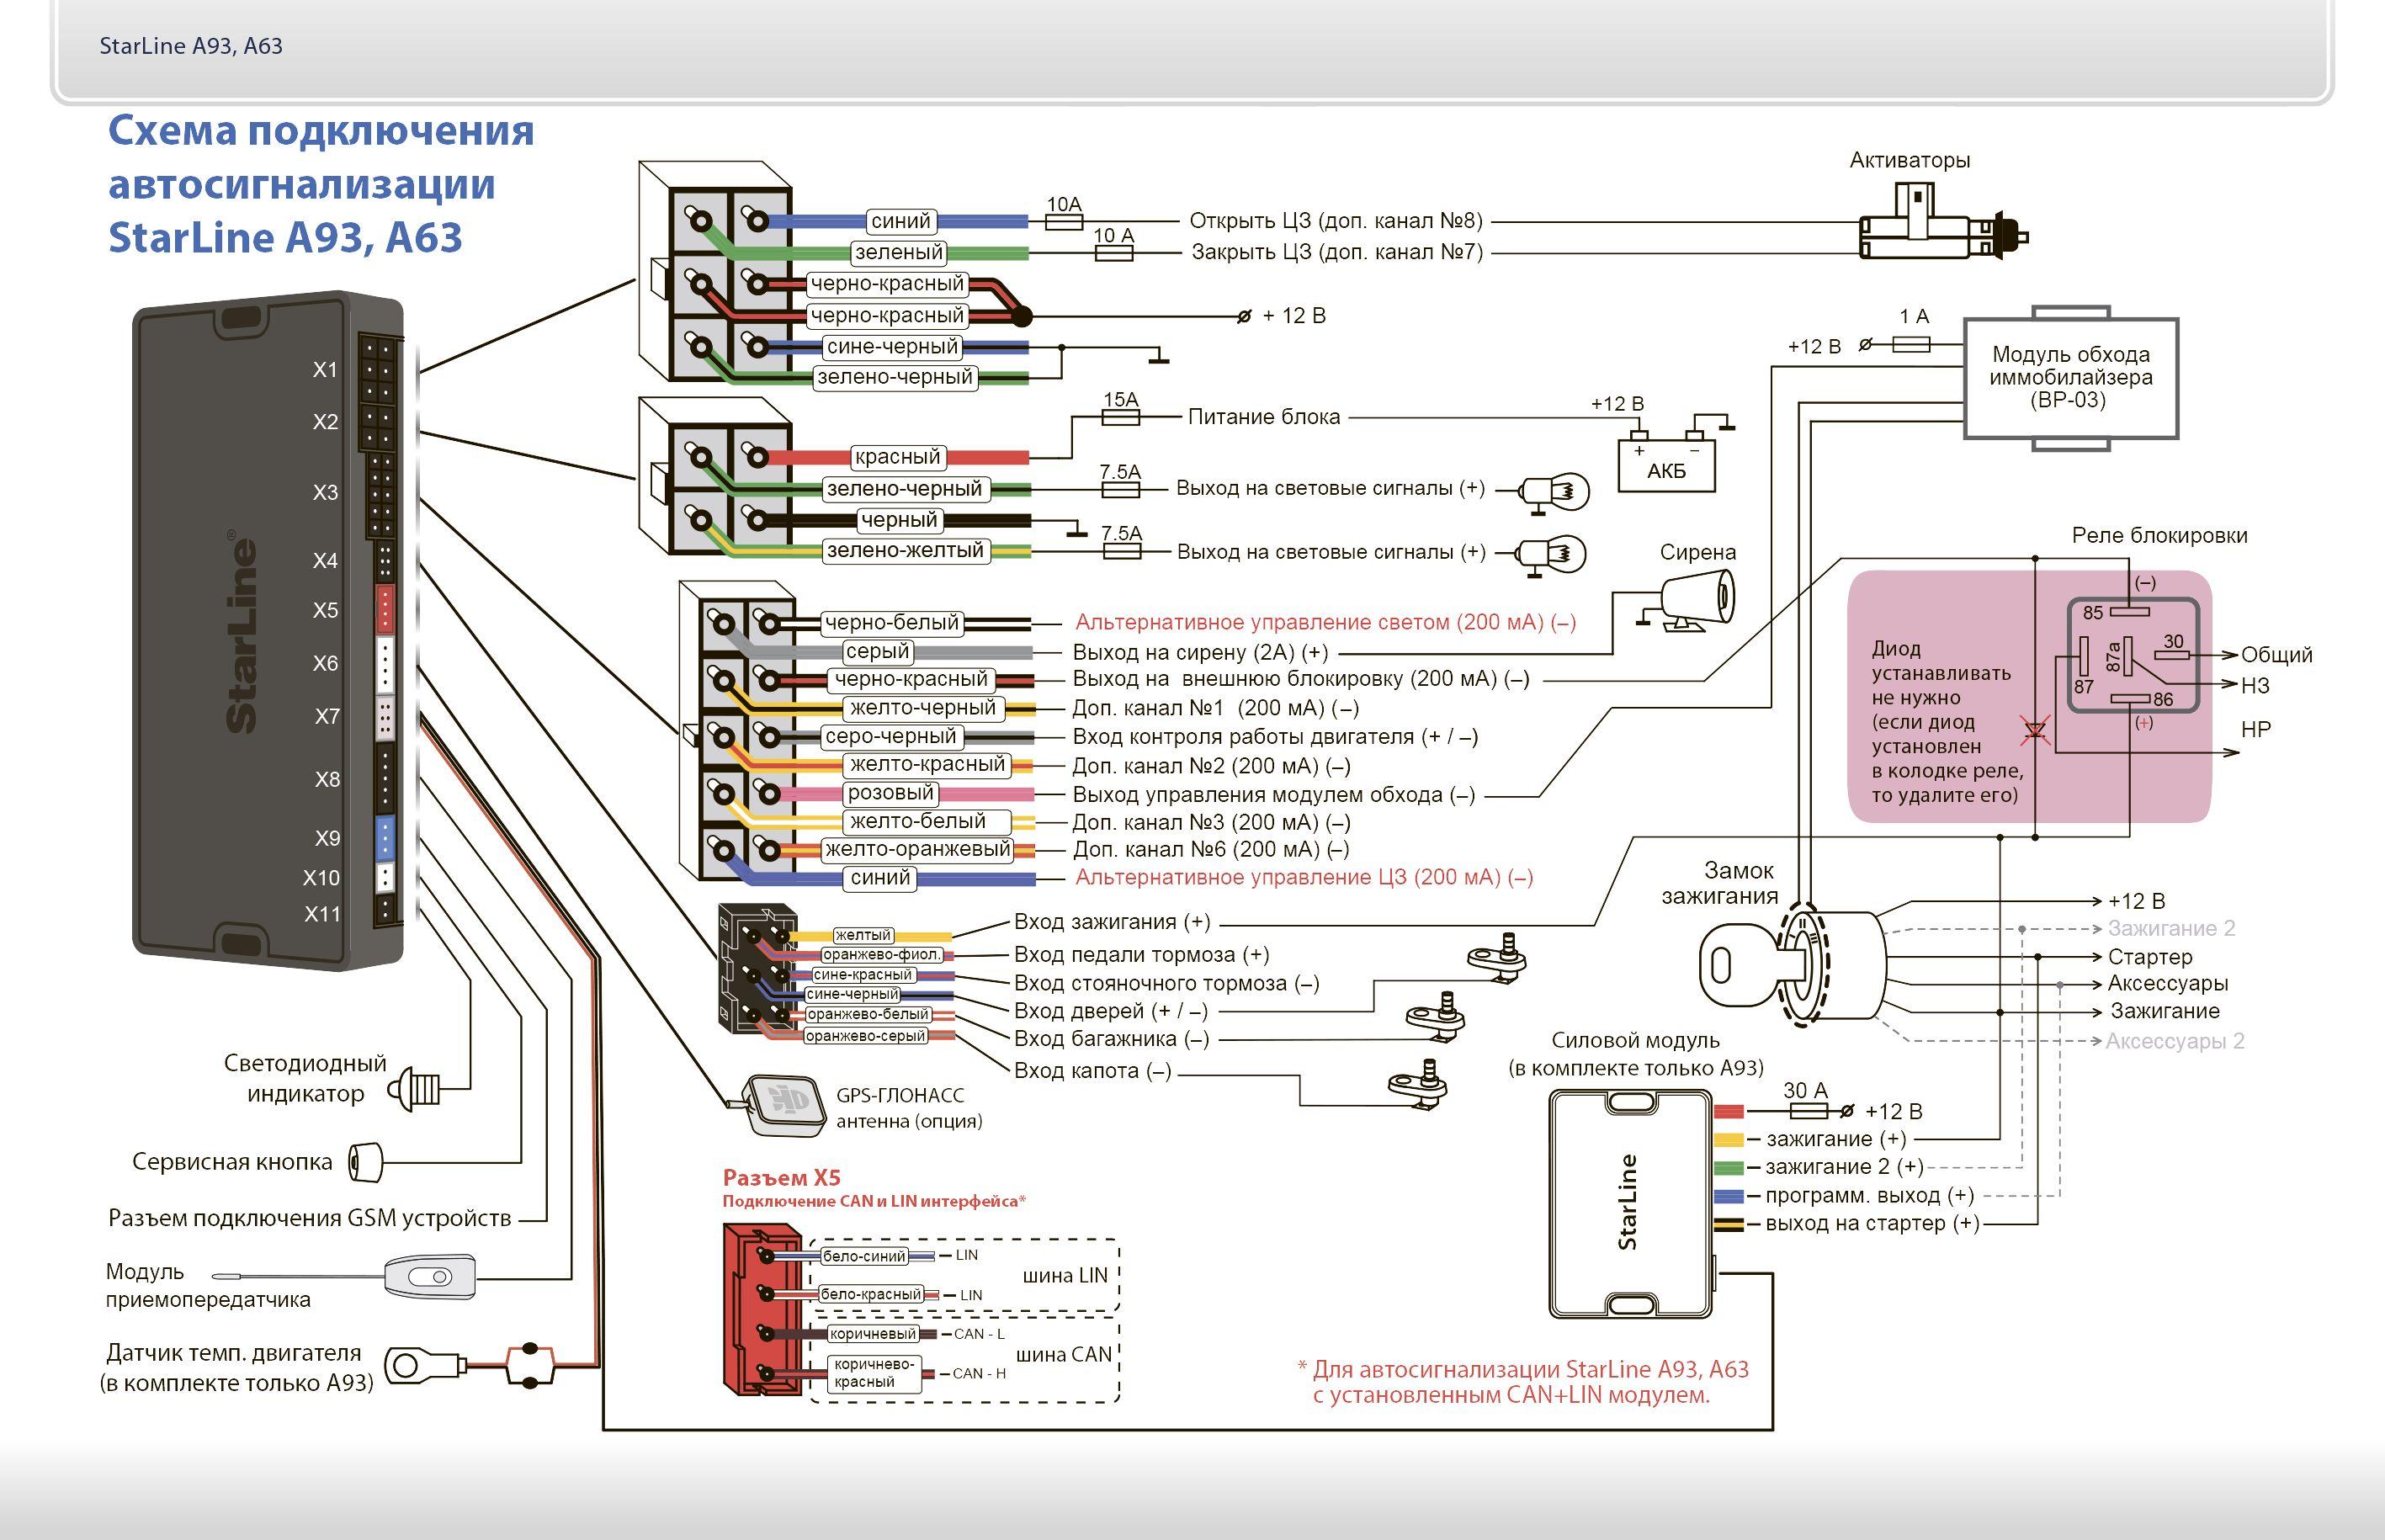 Starline b64 схема подключения